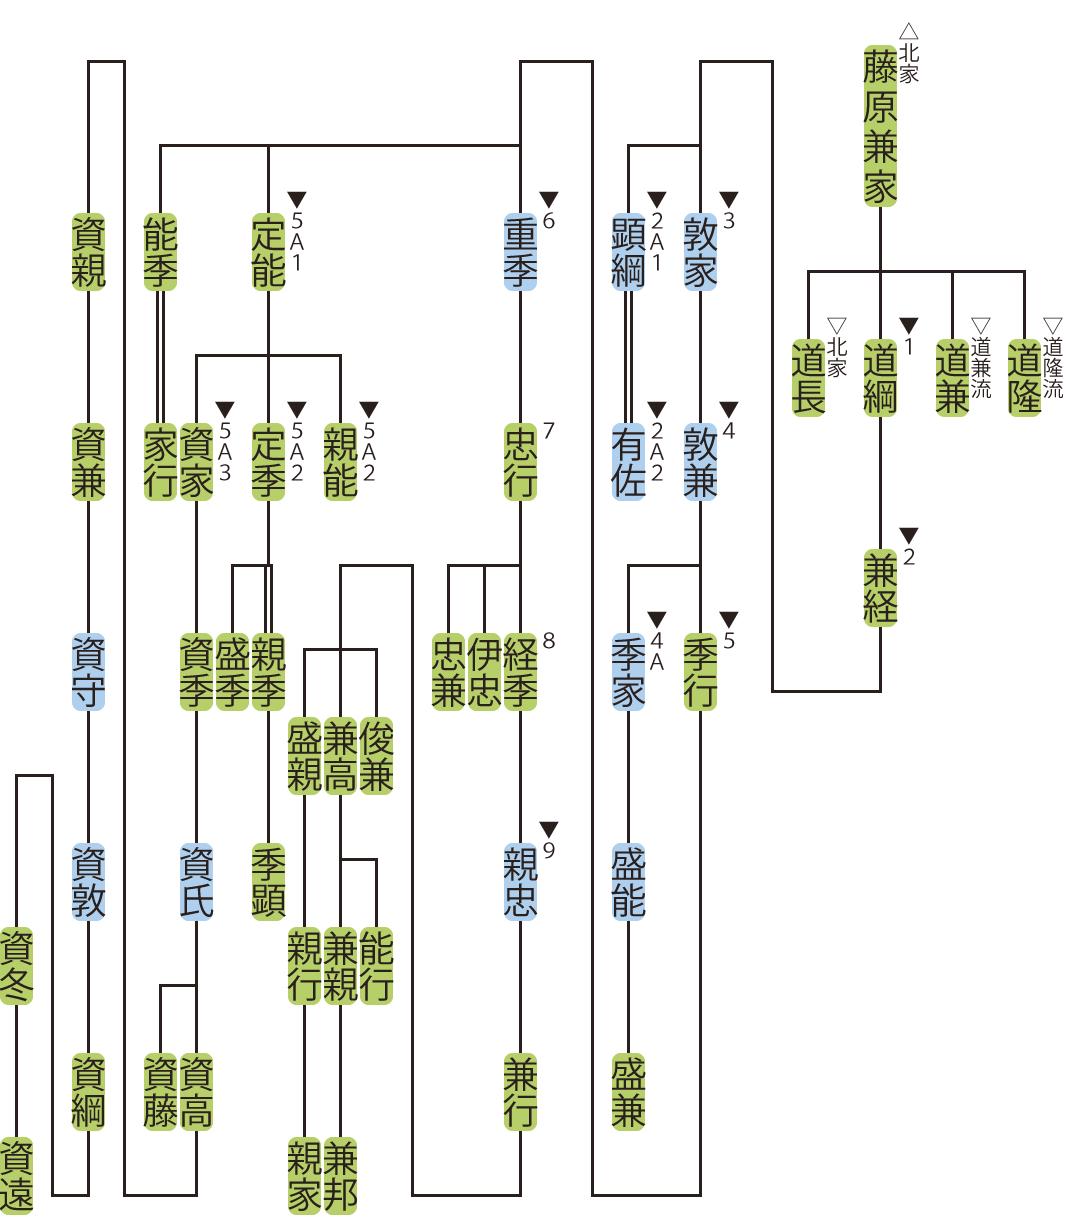 藤原氏北家・道綱流の略系図